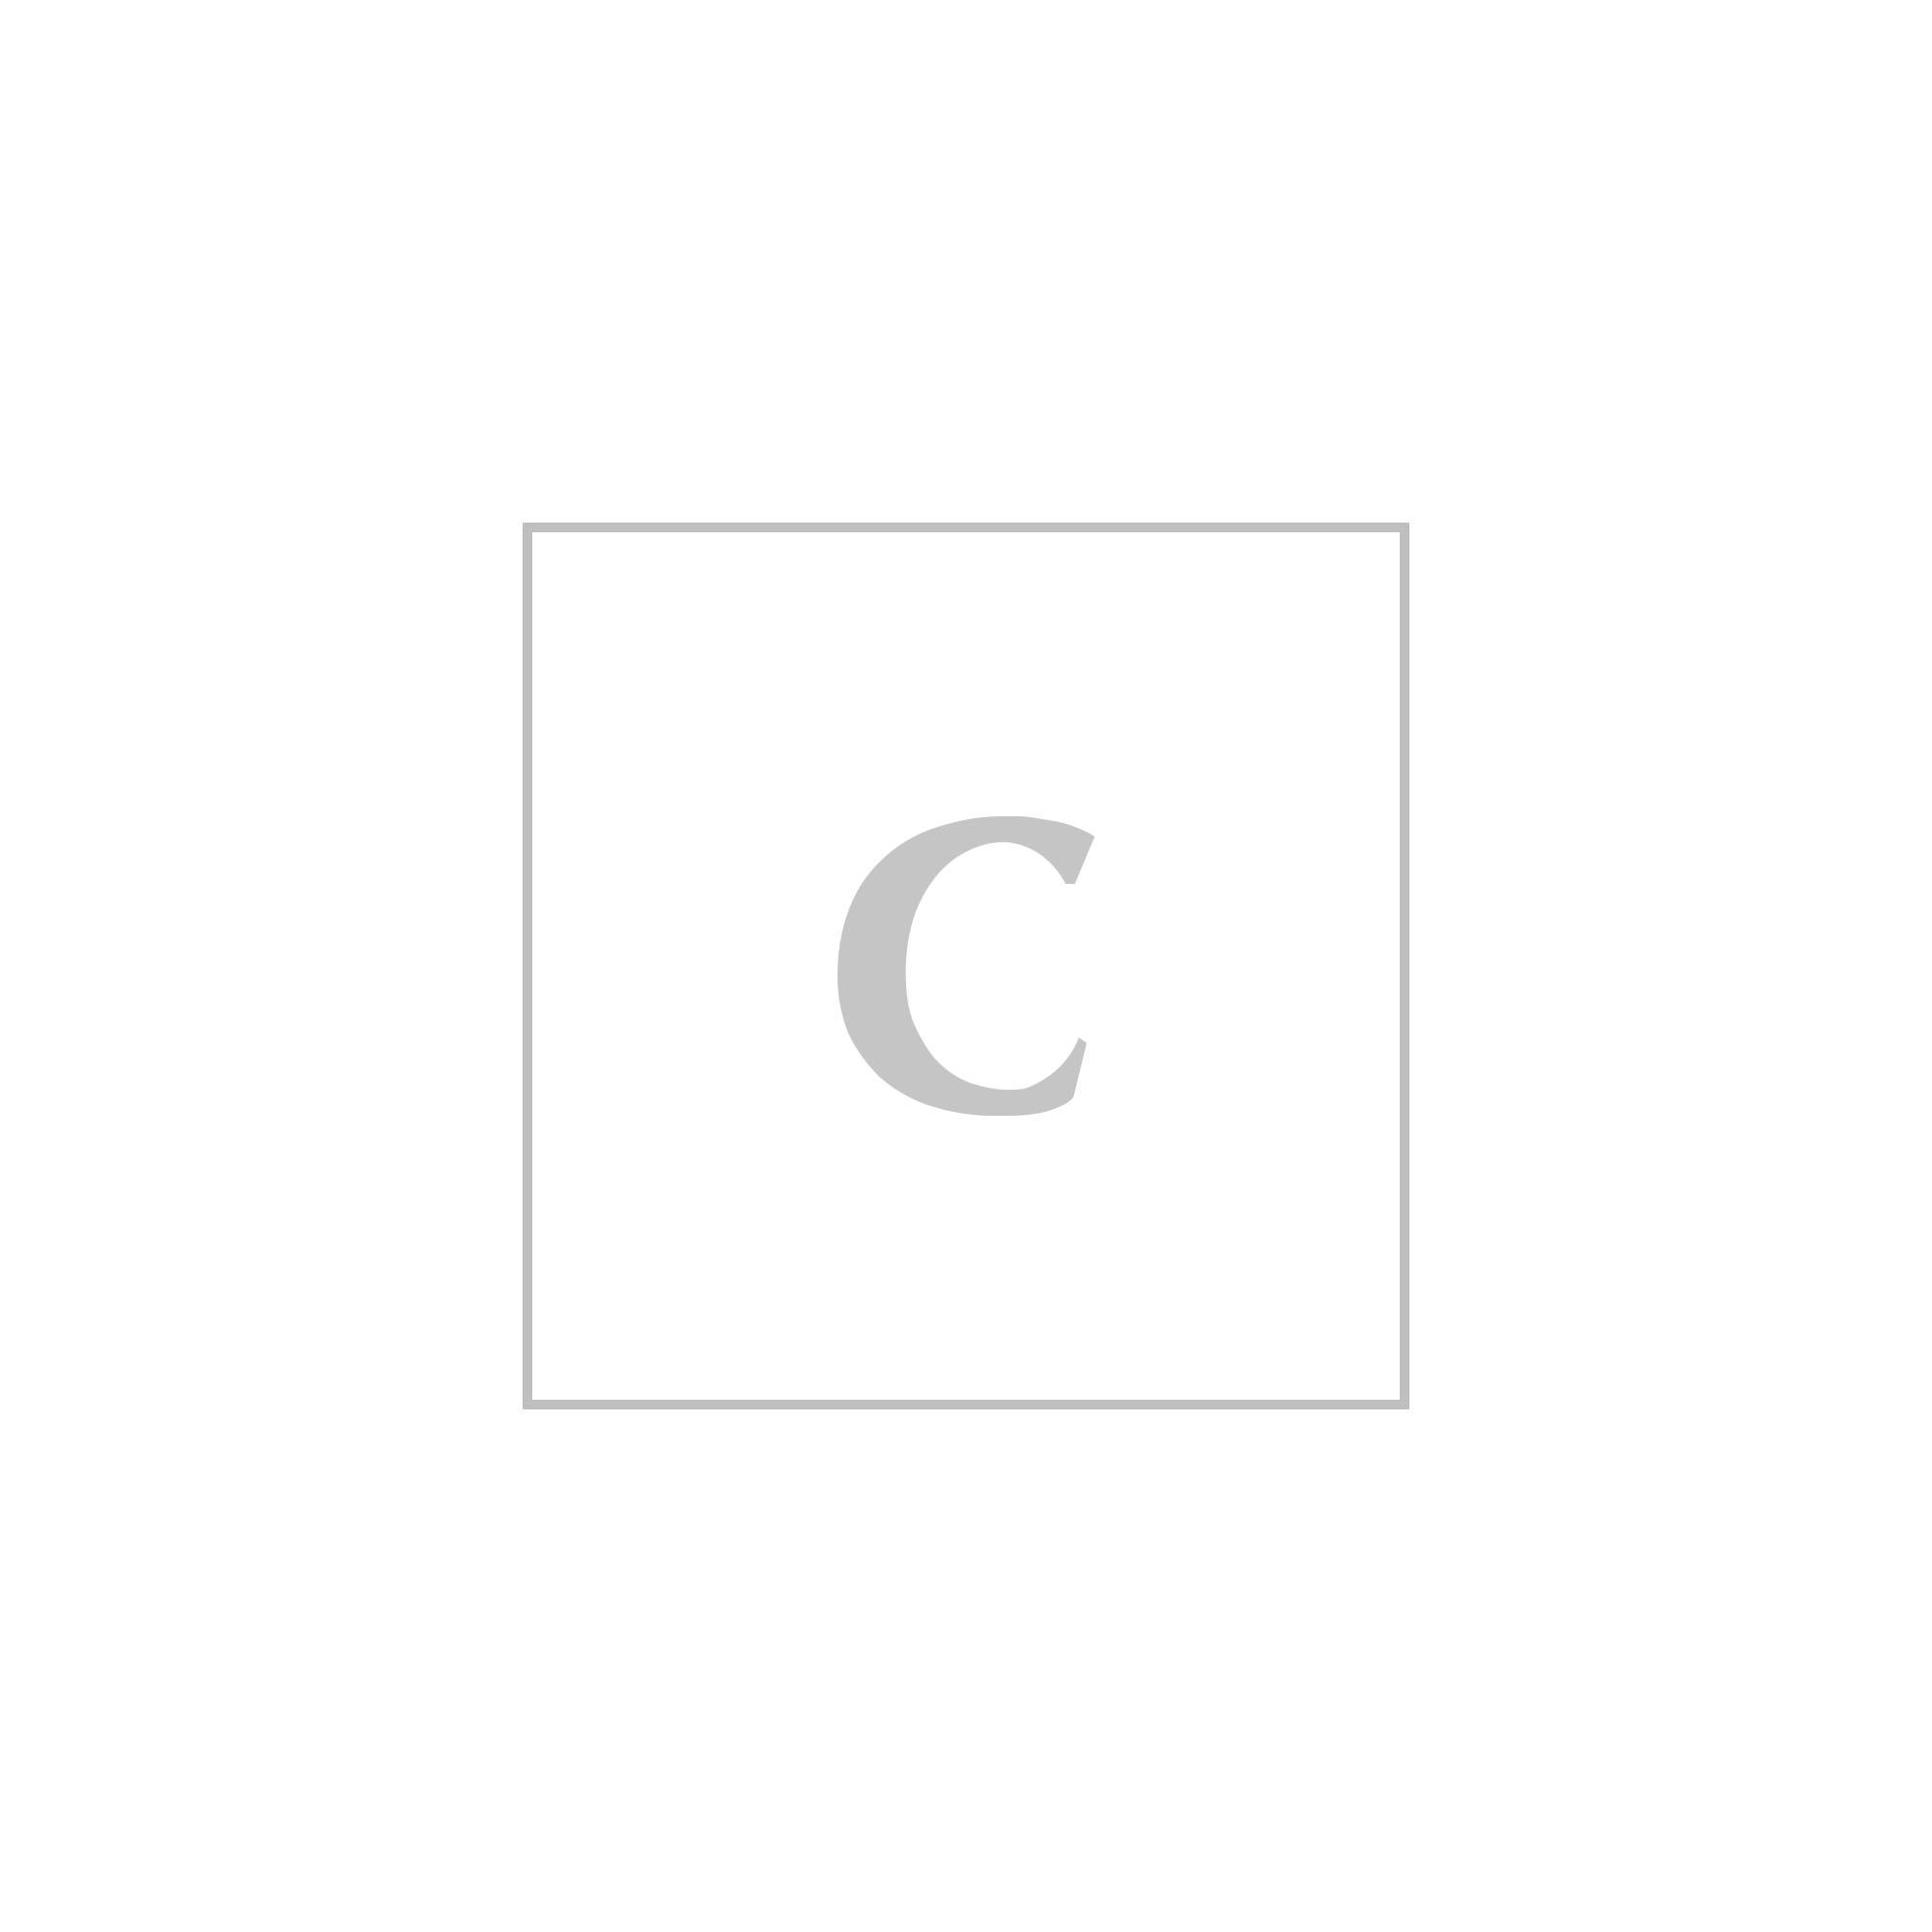 Stella mccartney mini tote bag metallic crackl